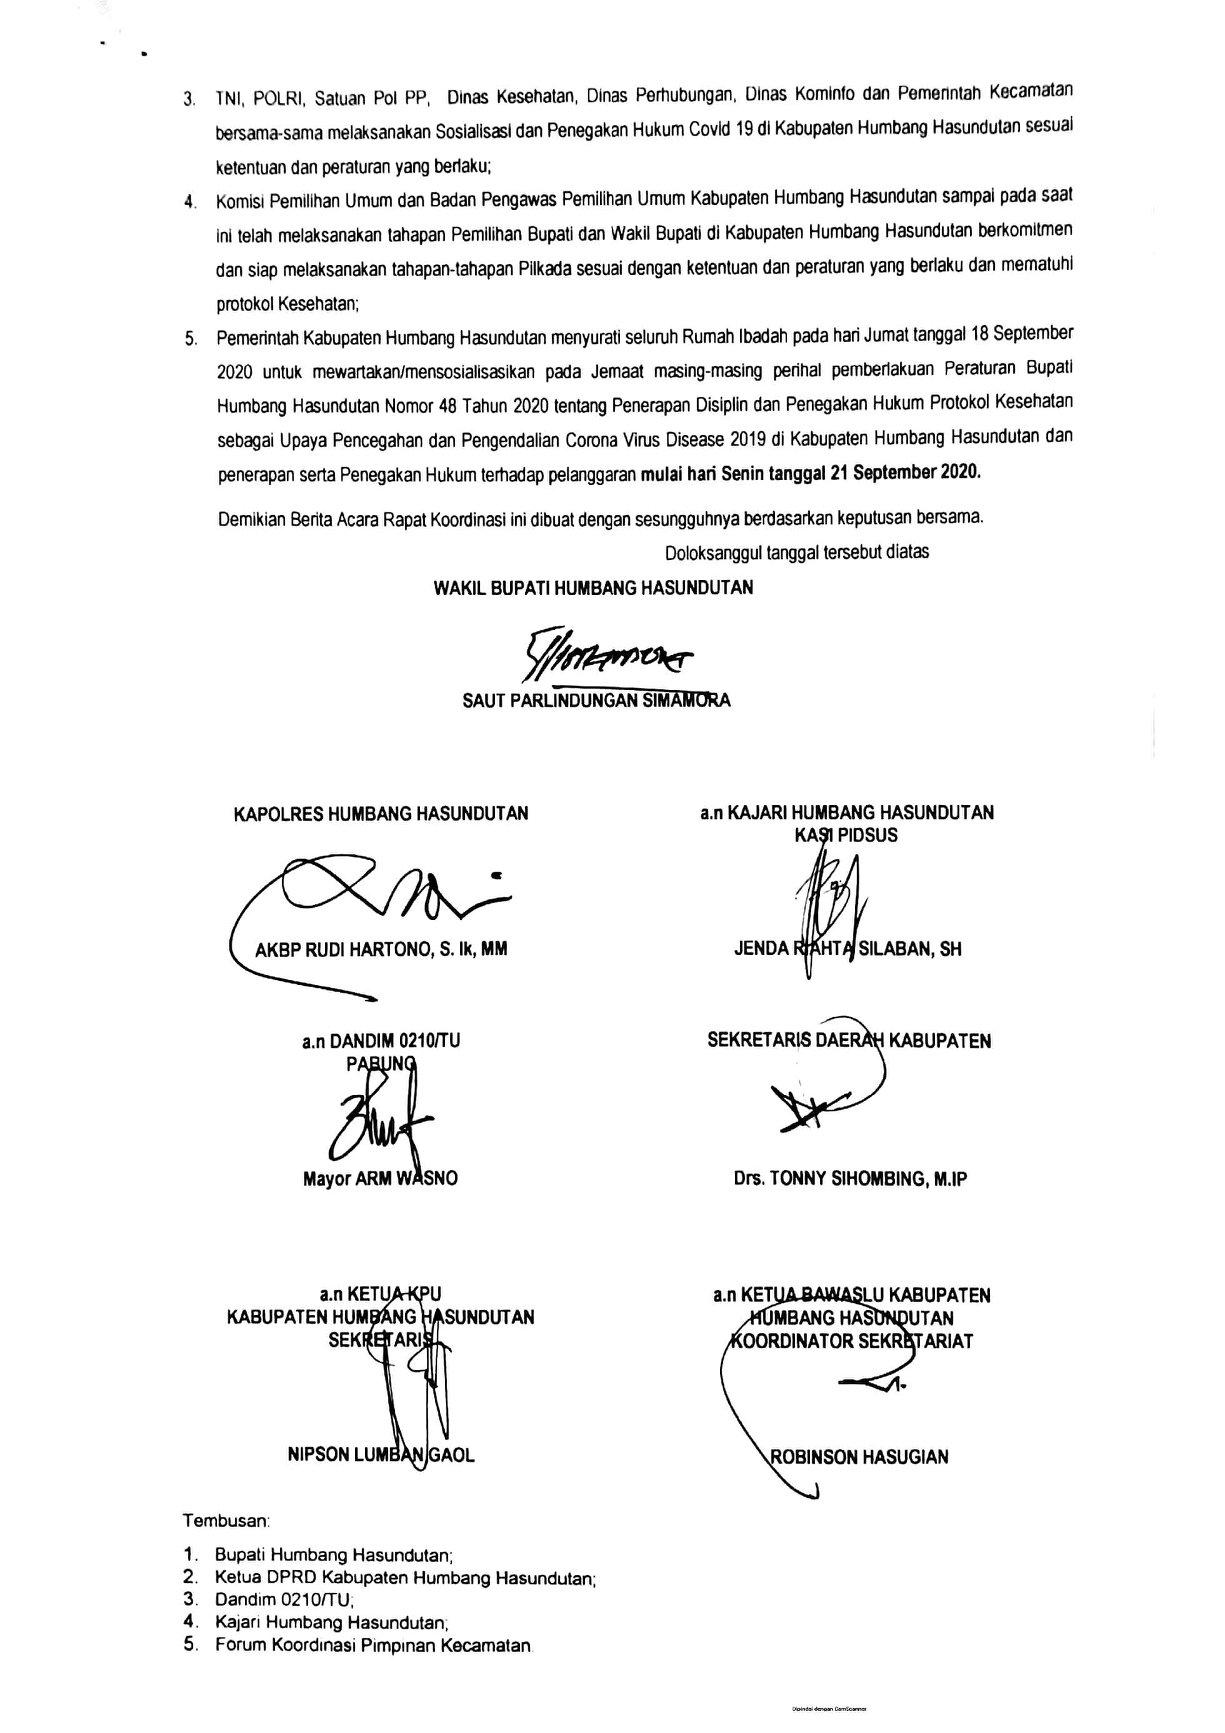 Rapat Koordinasi Penegakan Hukum Protokol Kesehatan Dalam Pencegahan dan Pengendalian Covid-19 Kab. Humbang Hasundutan